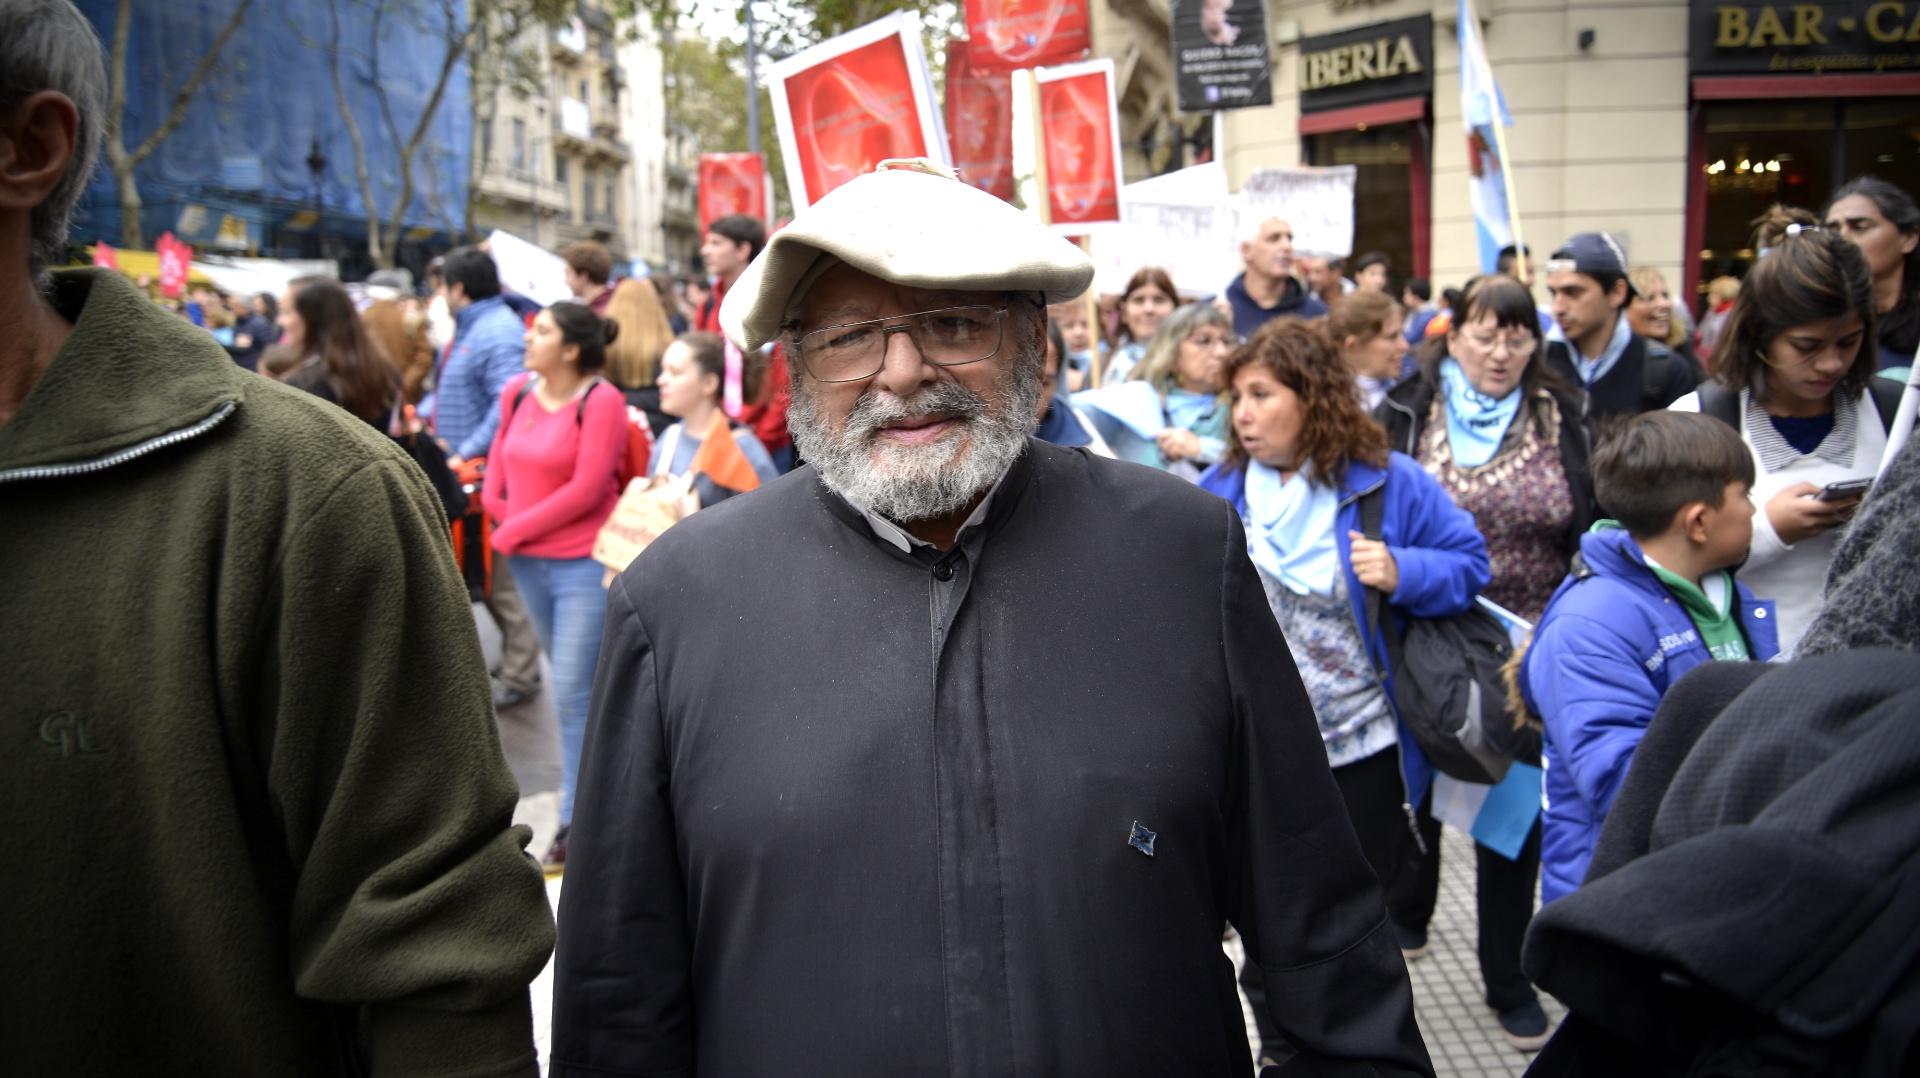 Entre los organizadores estuvo la agrupación +Vida, que días atrás lanzó el pañuelo celeste junto a diputados antiabortistas